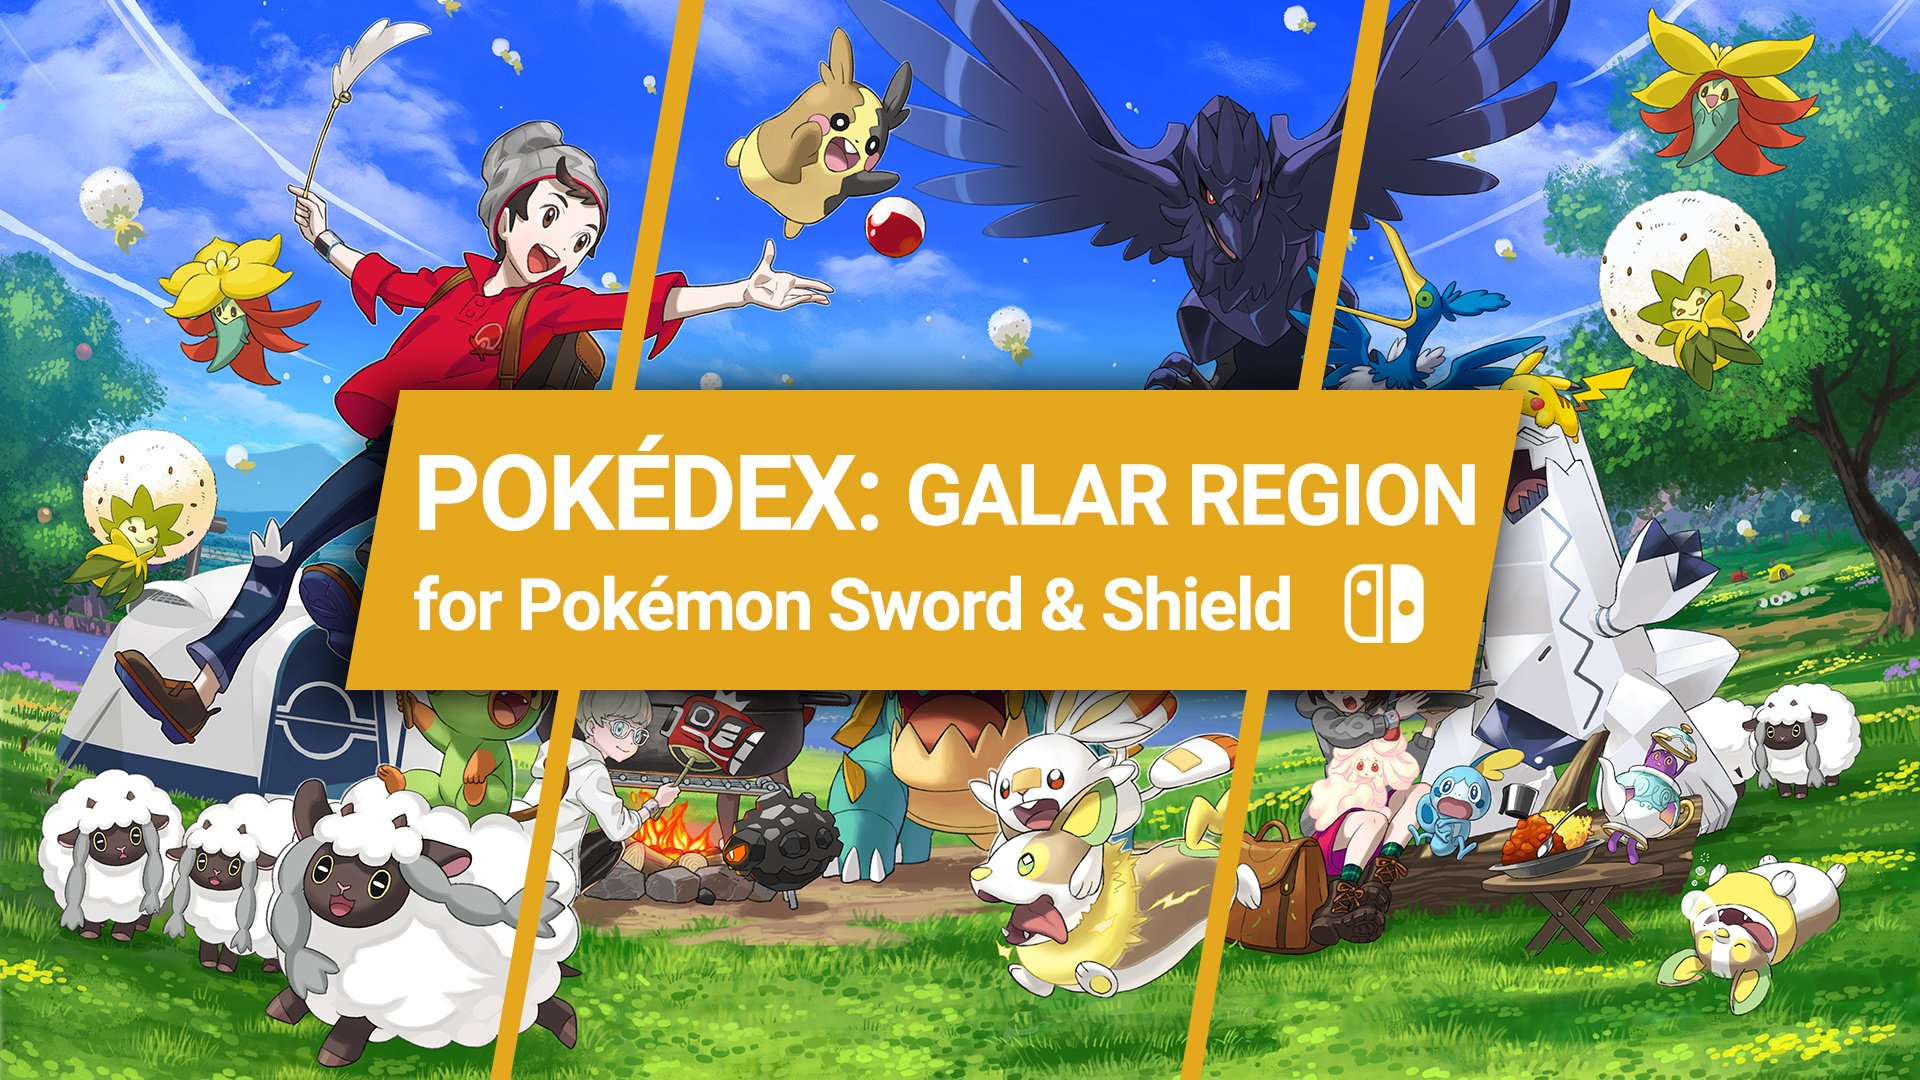 Pokemon Sword And Shield Pokedex Galar Region Nintendo Life A groovy way to use the java virtual machine. pokemon sword and shield pokedex galar